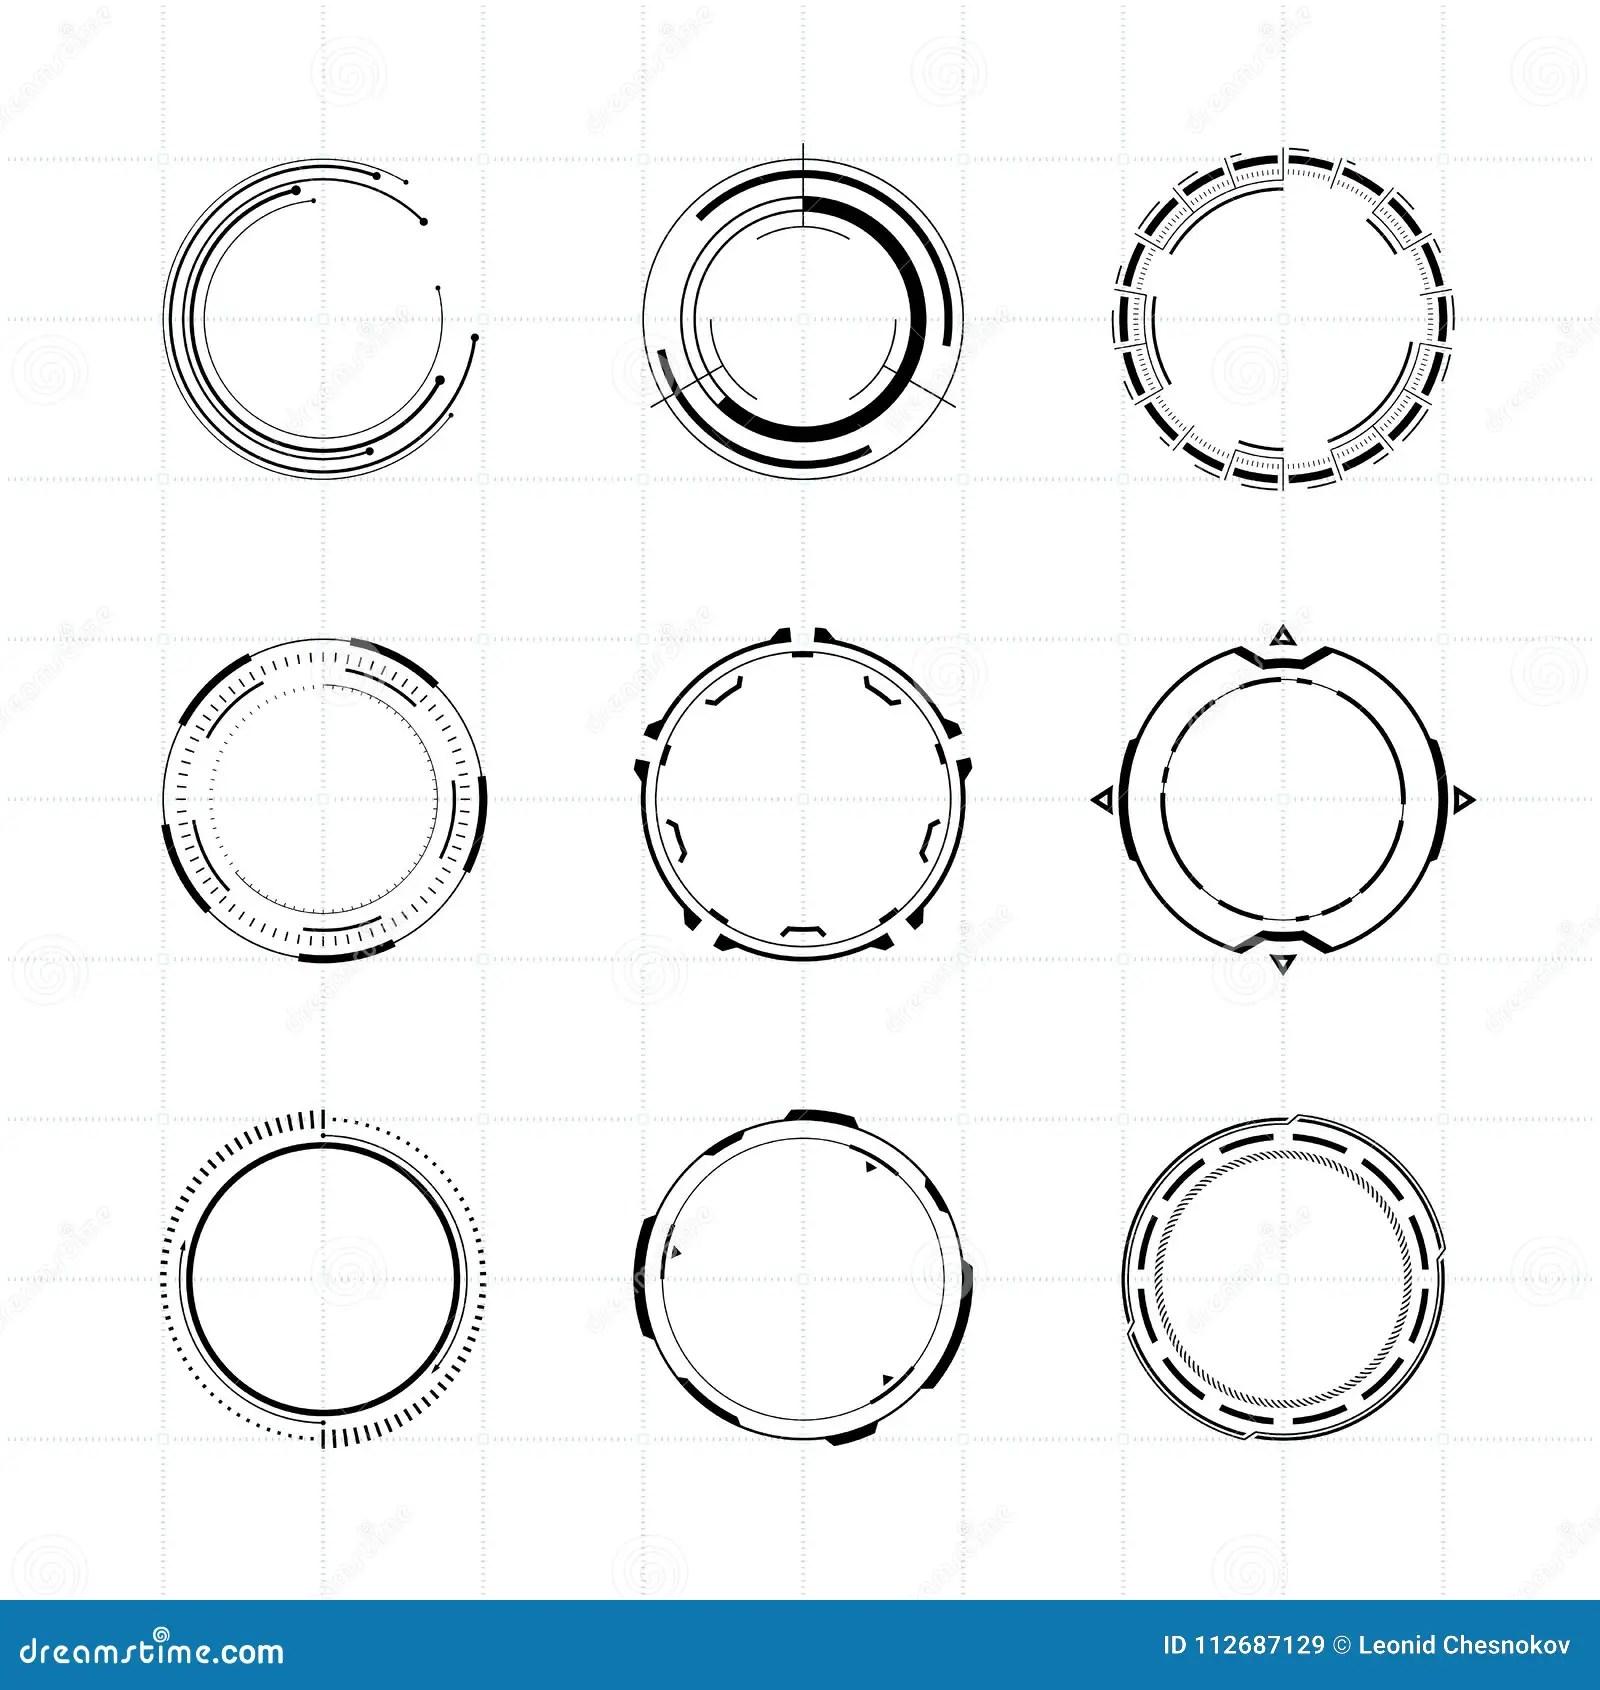 Futuristic User Interface Circle Elements Set Stock Vector